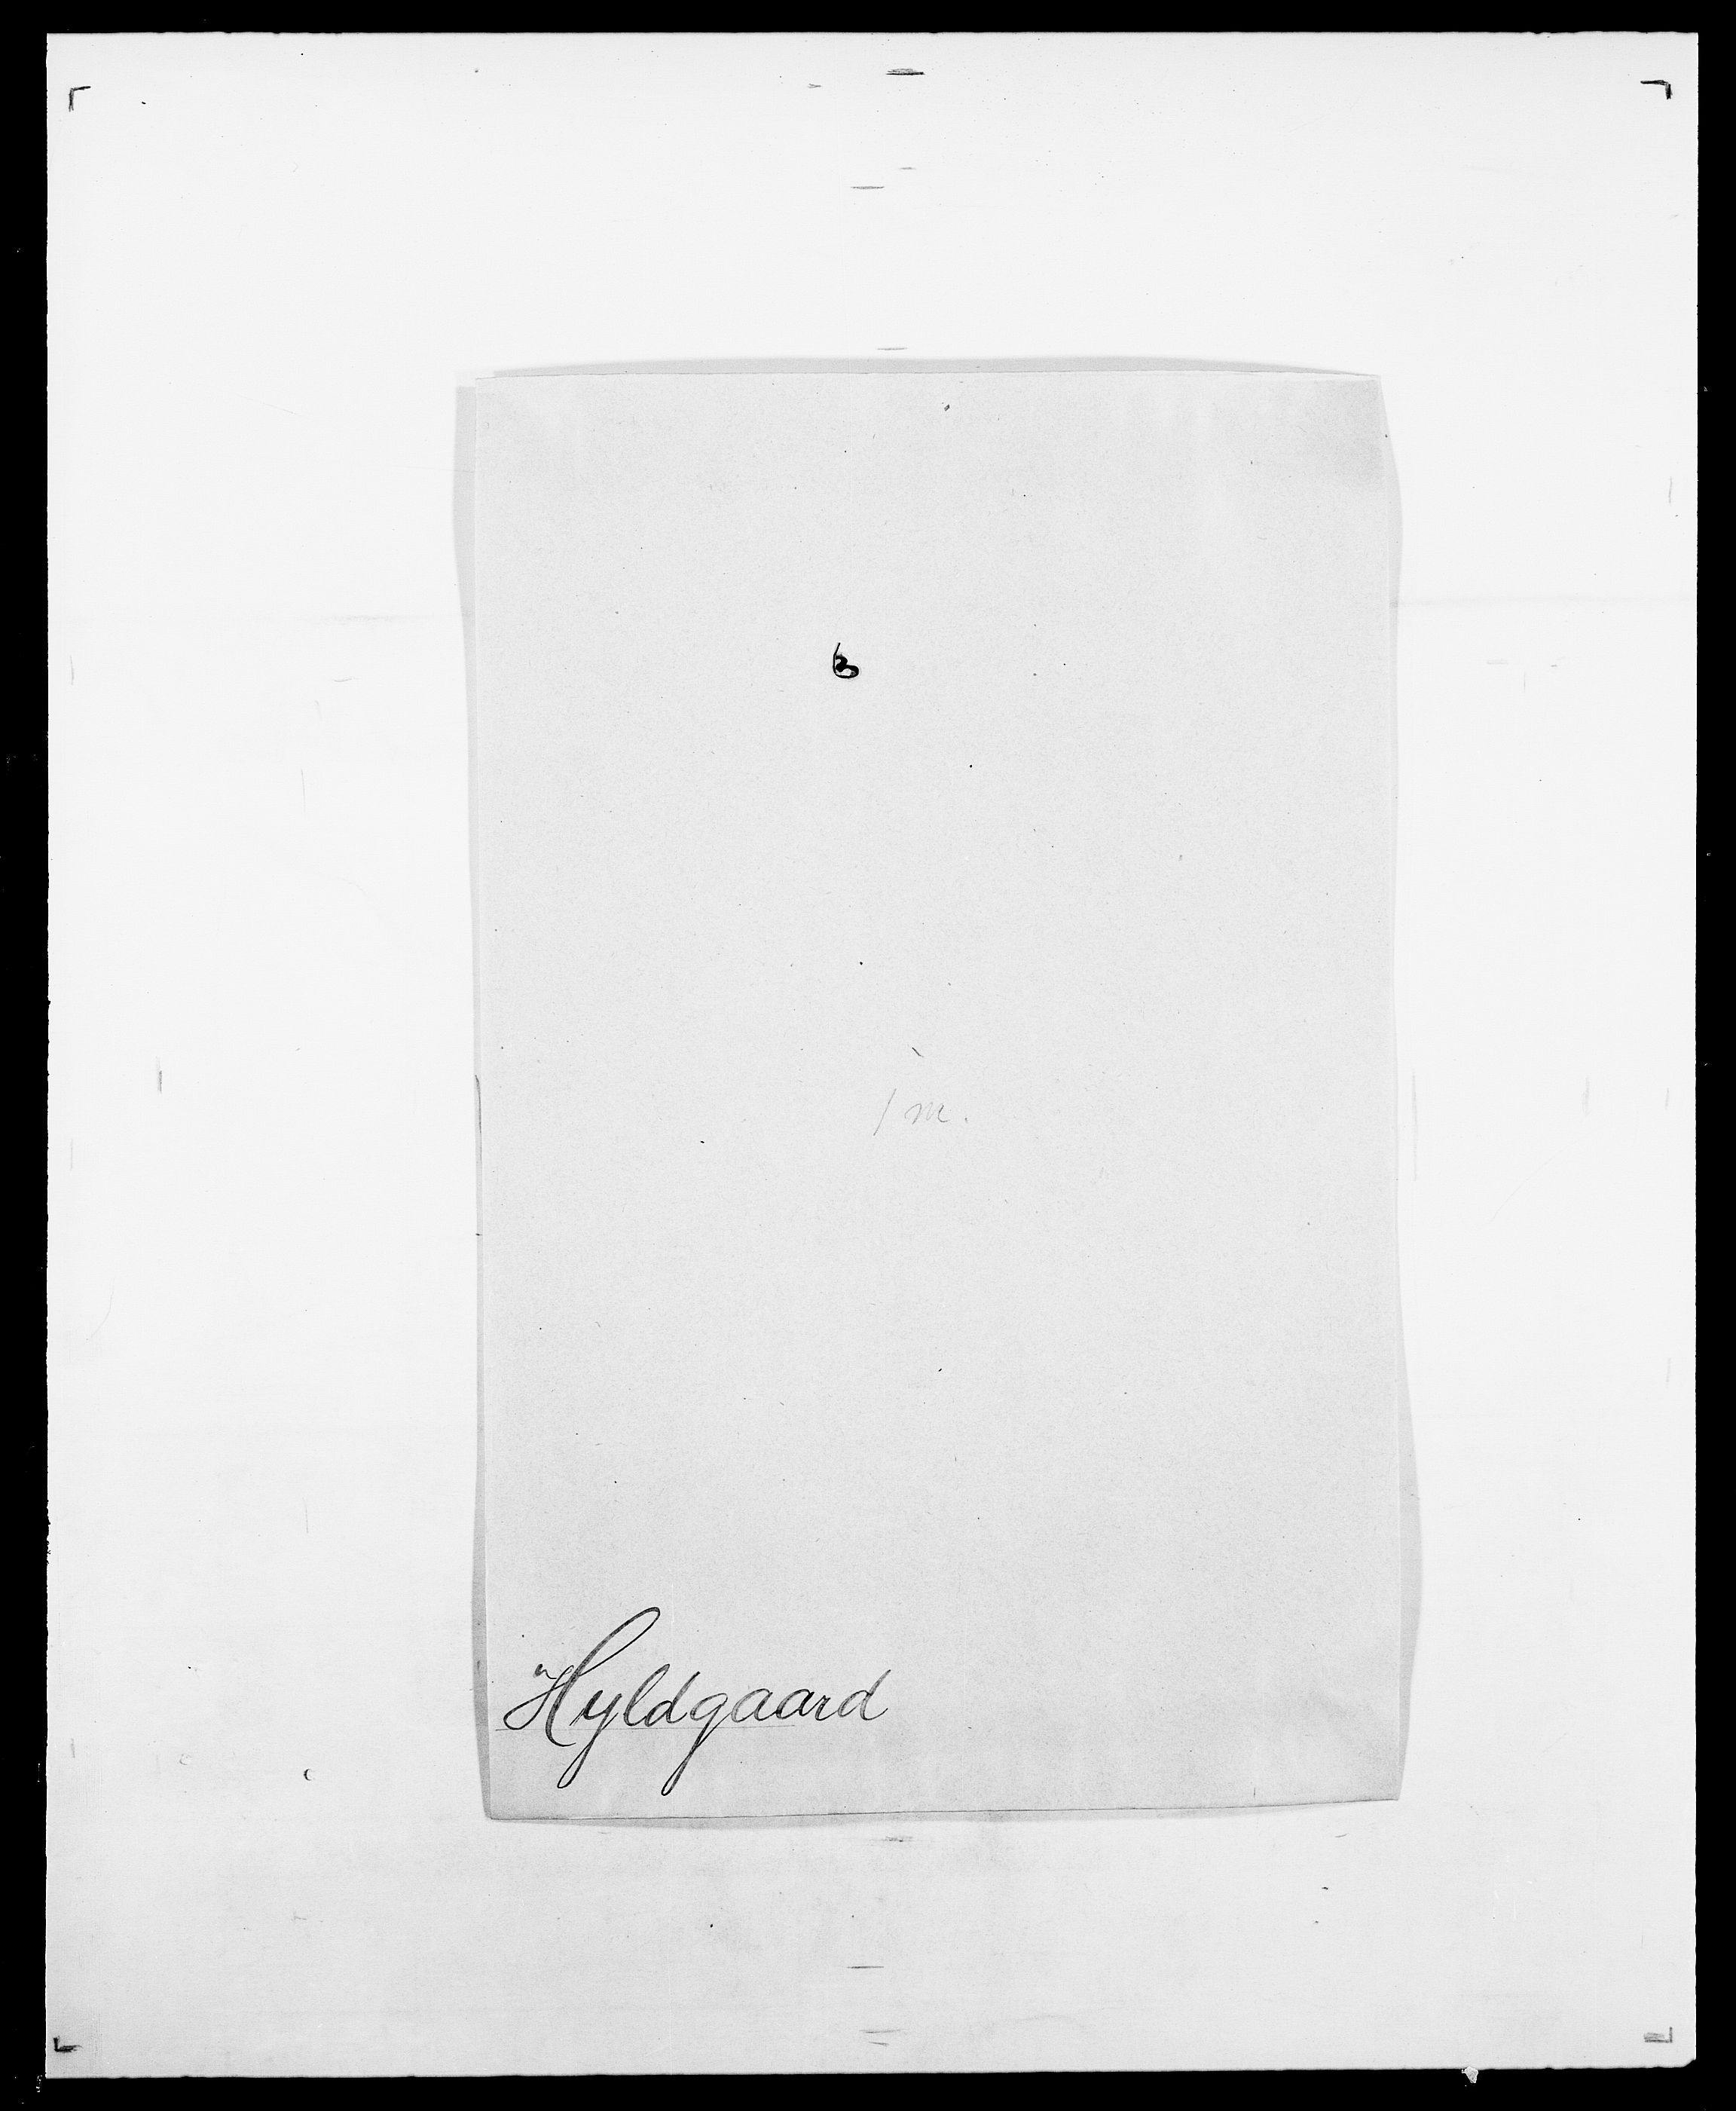 SAO, Delgobe, Charles Antoine - samling, D/Da/L0019: van der Hude - Joys, s. 262